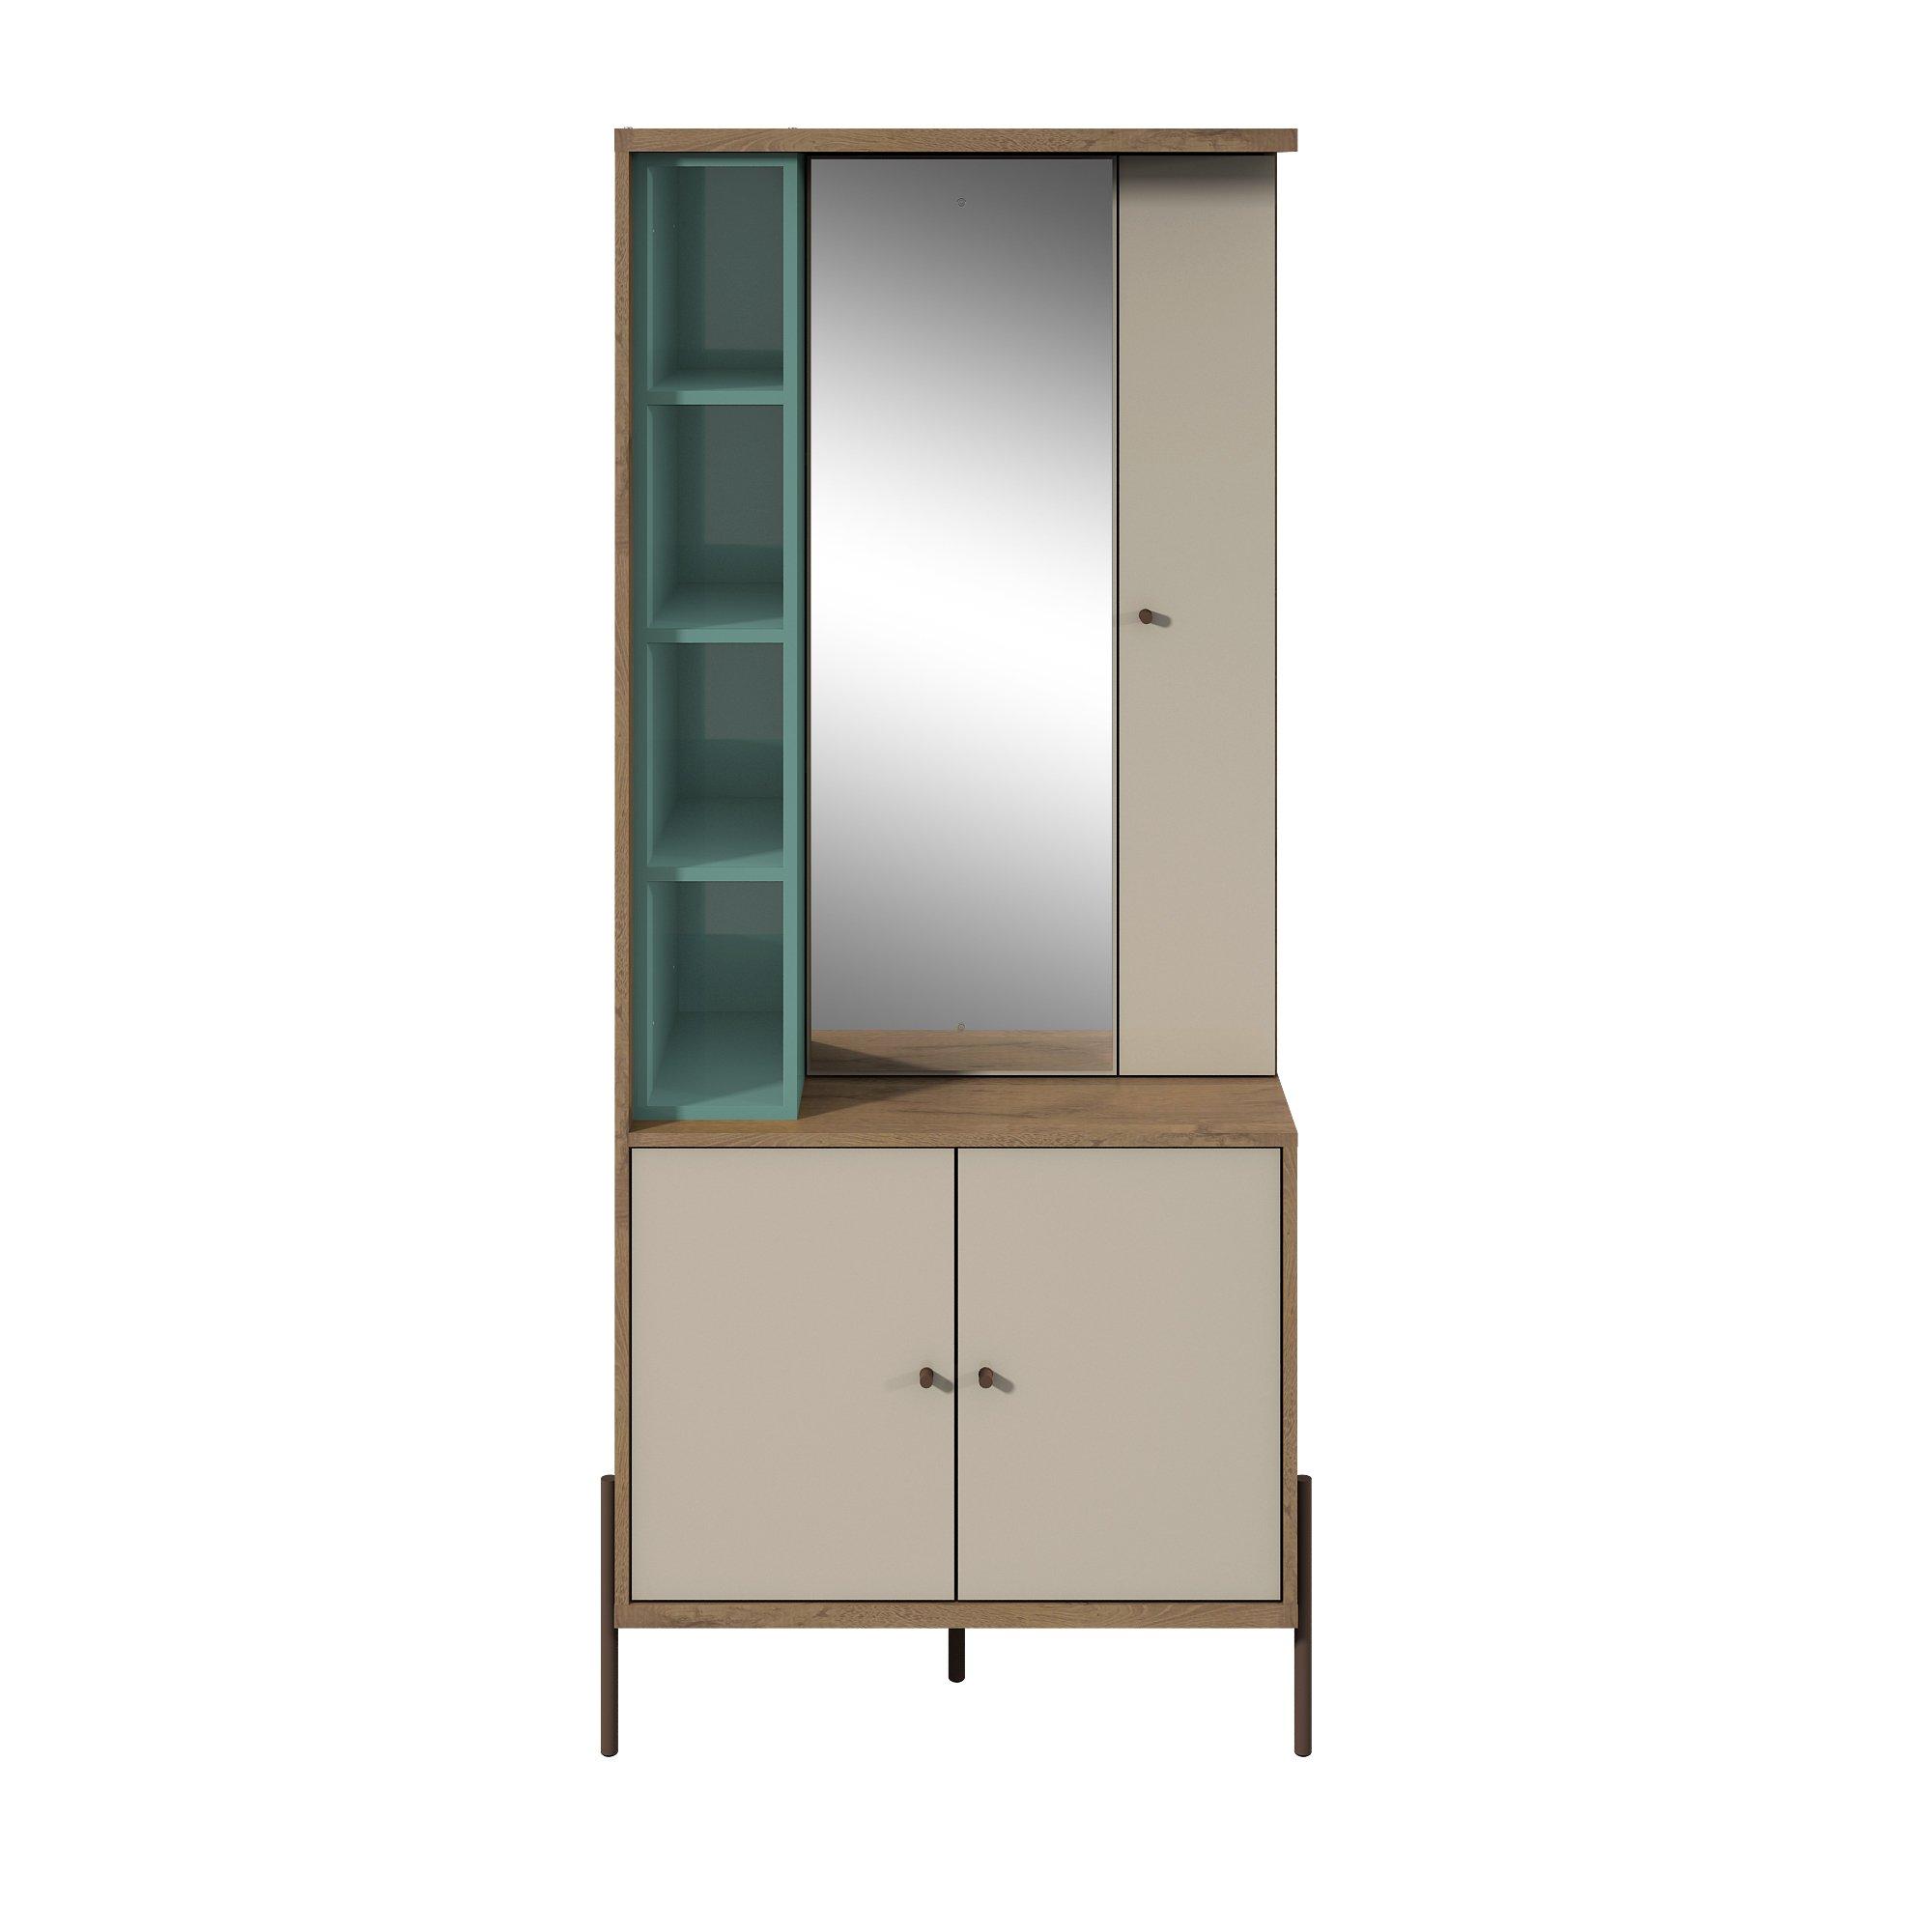 Manhattan Comfort 350712 Joy Series Large Bedroom Storage Jewelry Vanity Armoire, Blue/Off-White